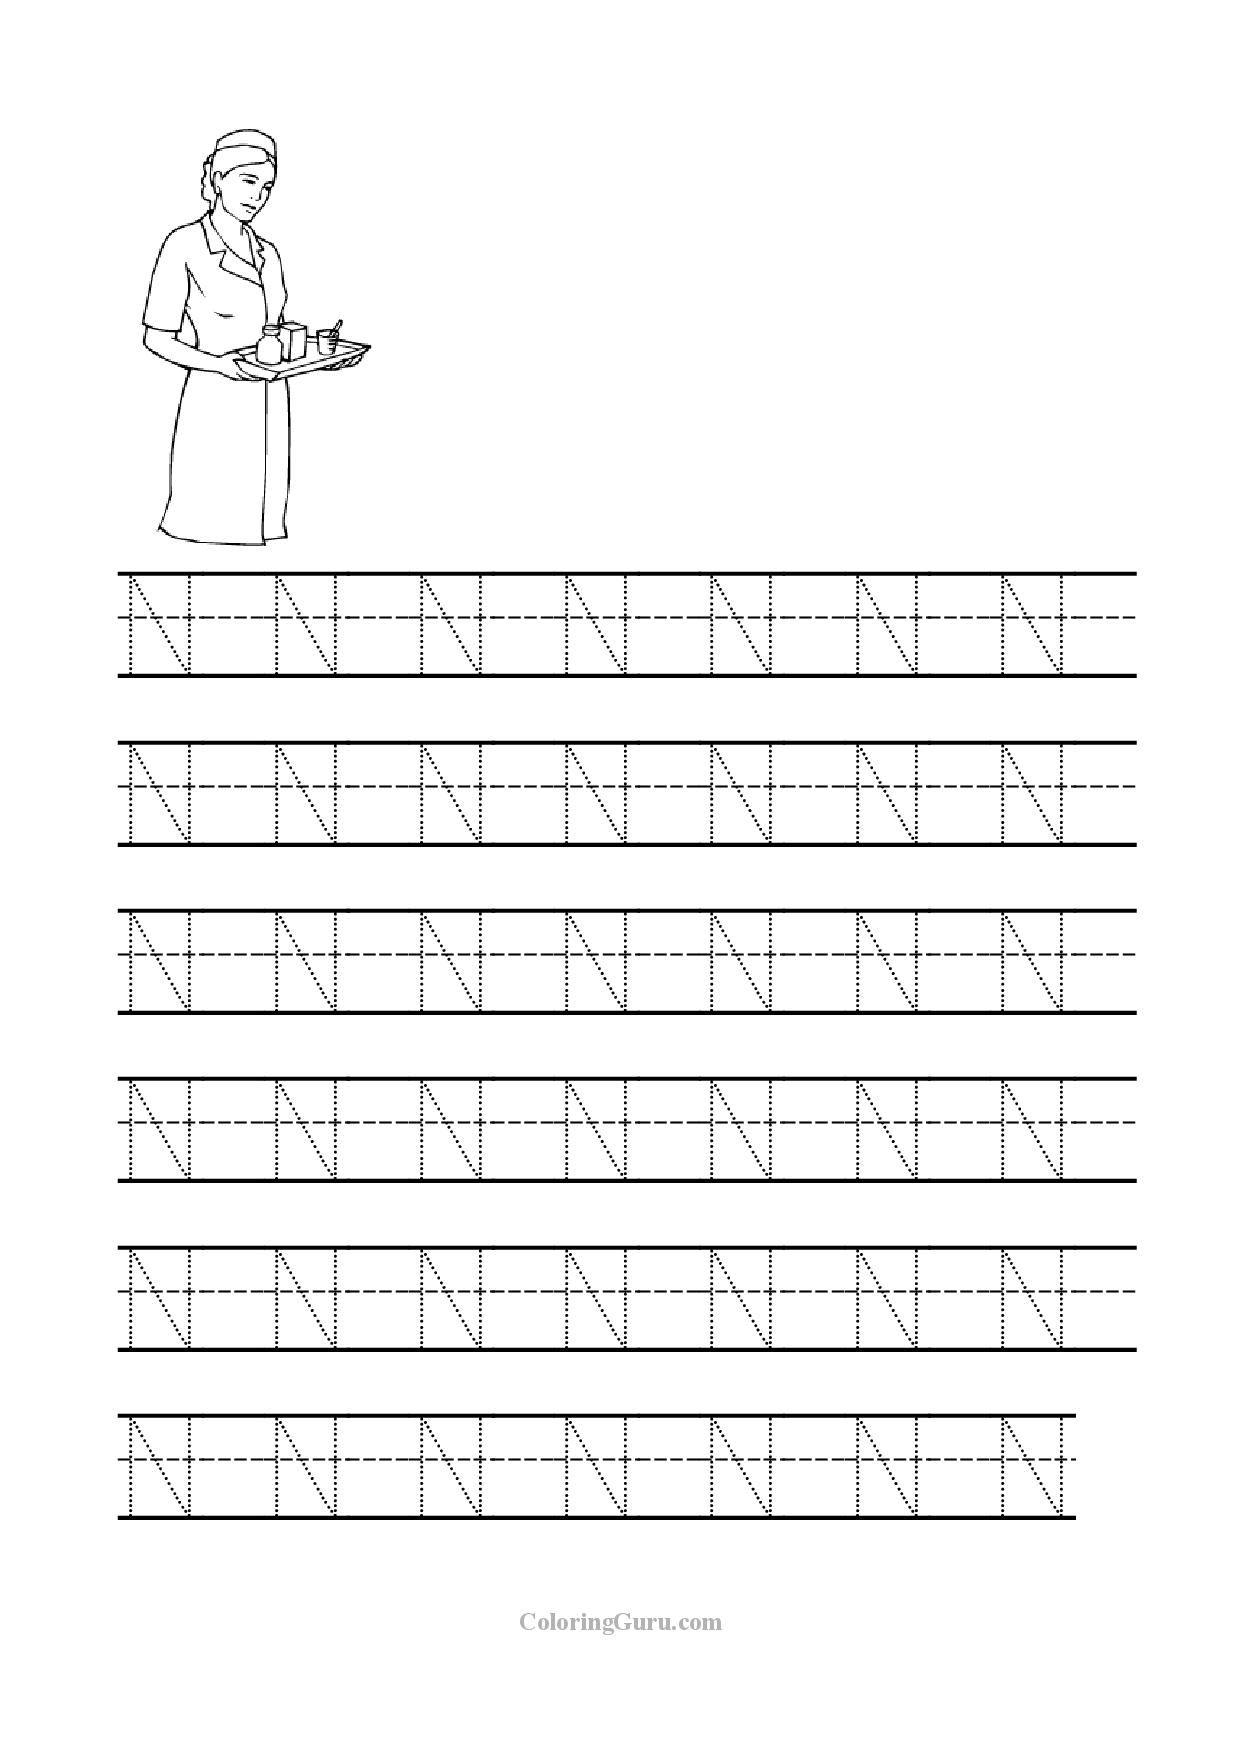 14 Interesting Letter N Worksheets For Kids | Kittybabylove intended for Letter N Worksheets Sparklebox